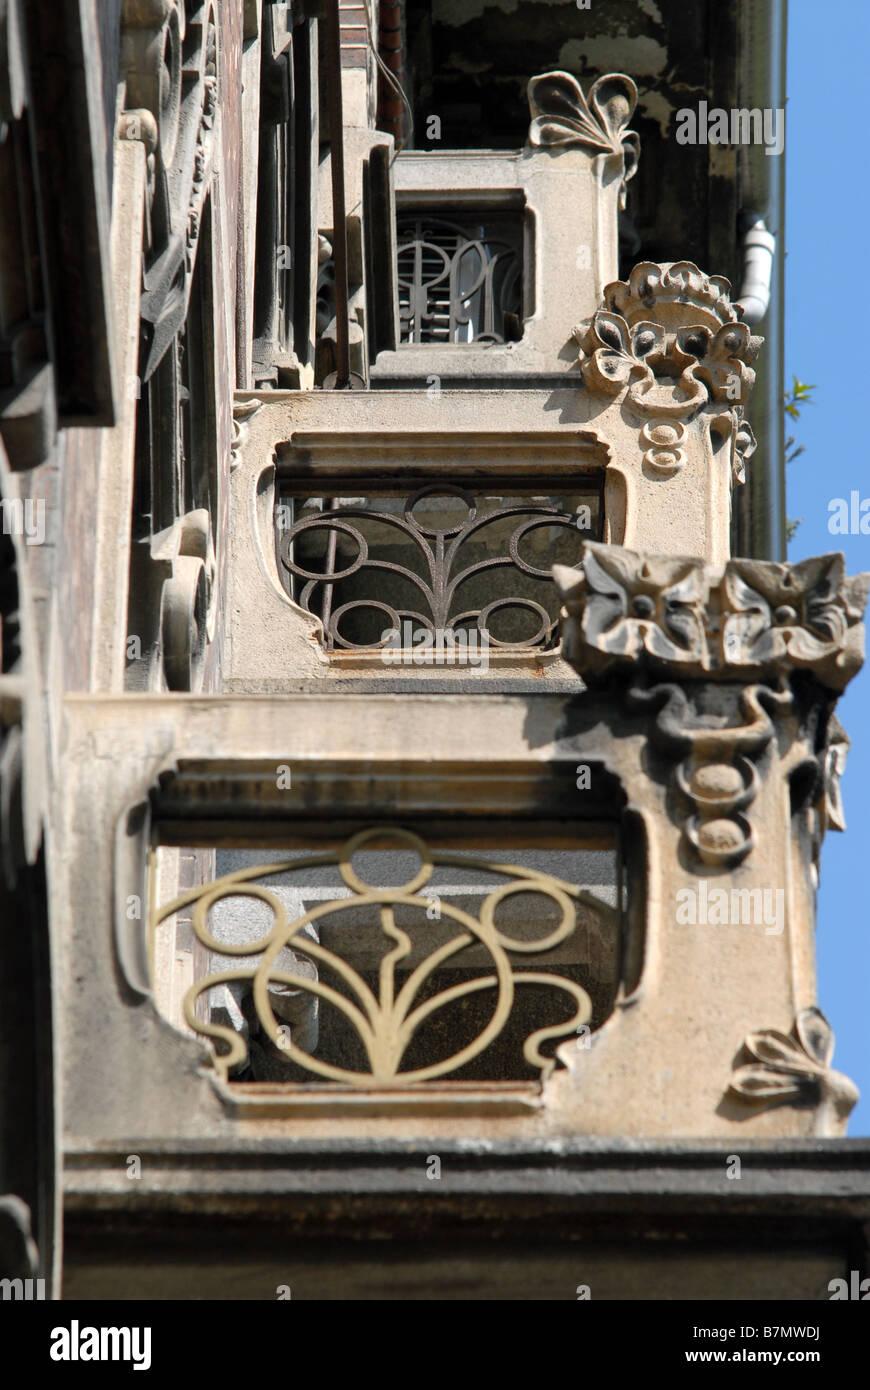 Balconies on buildings on Corso Galileo Ferraris, Turin, Piedmont, Italy. - Stock Image